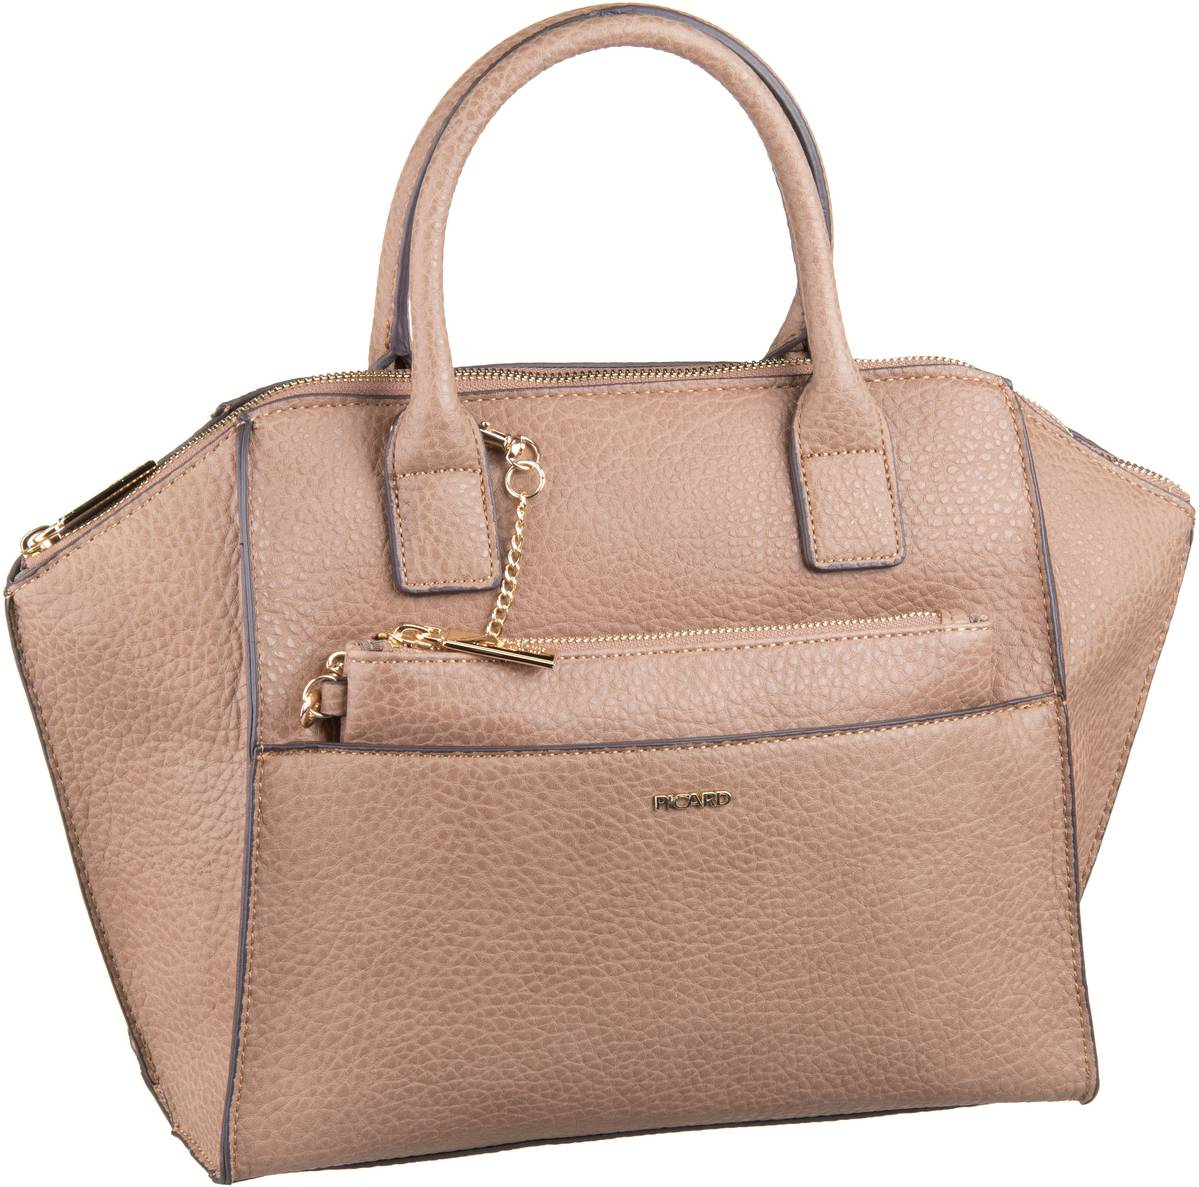 Handtasche Wallaby 2304 Rosewood